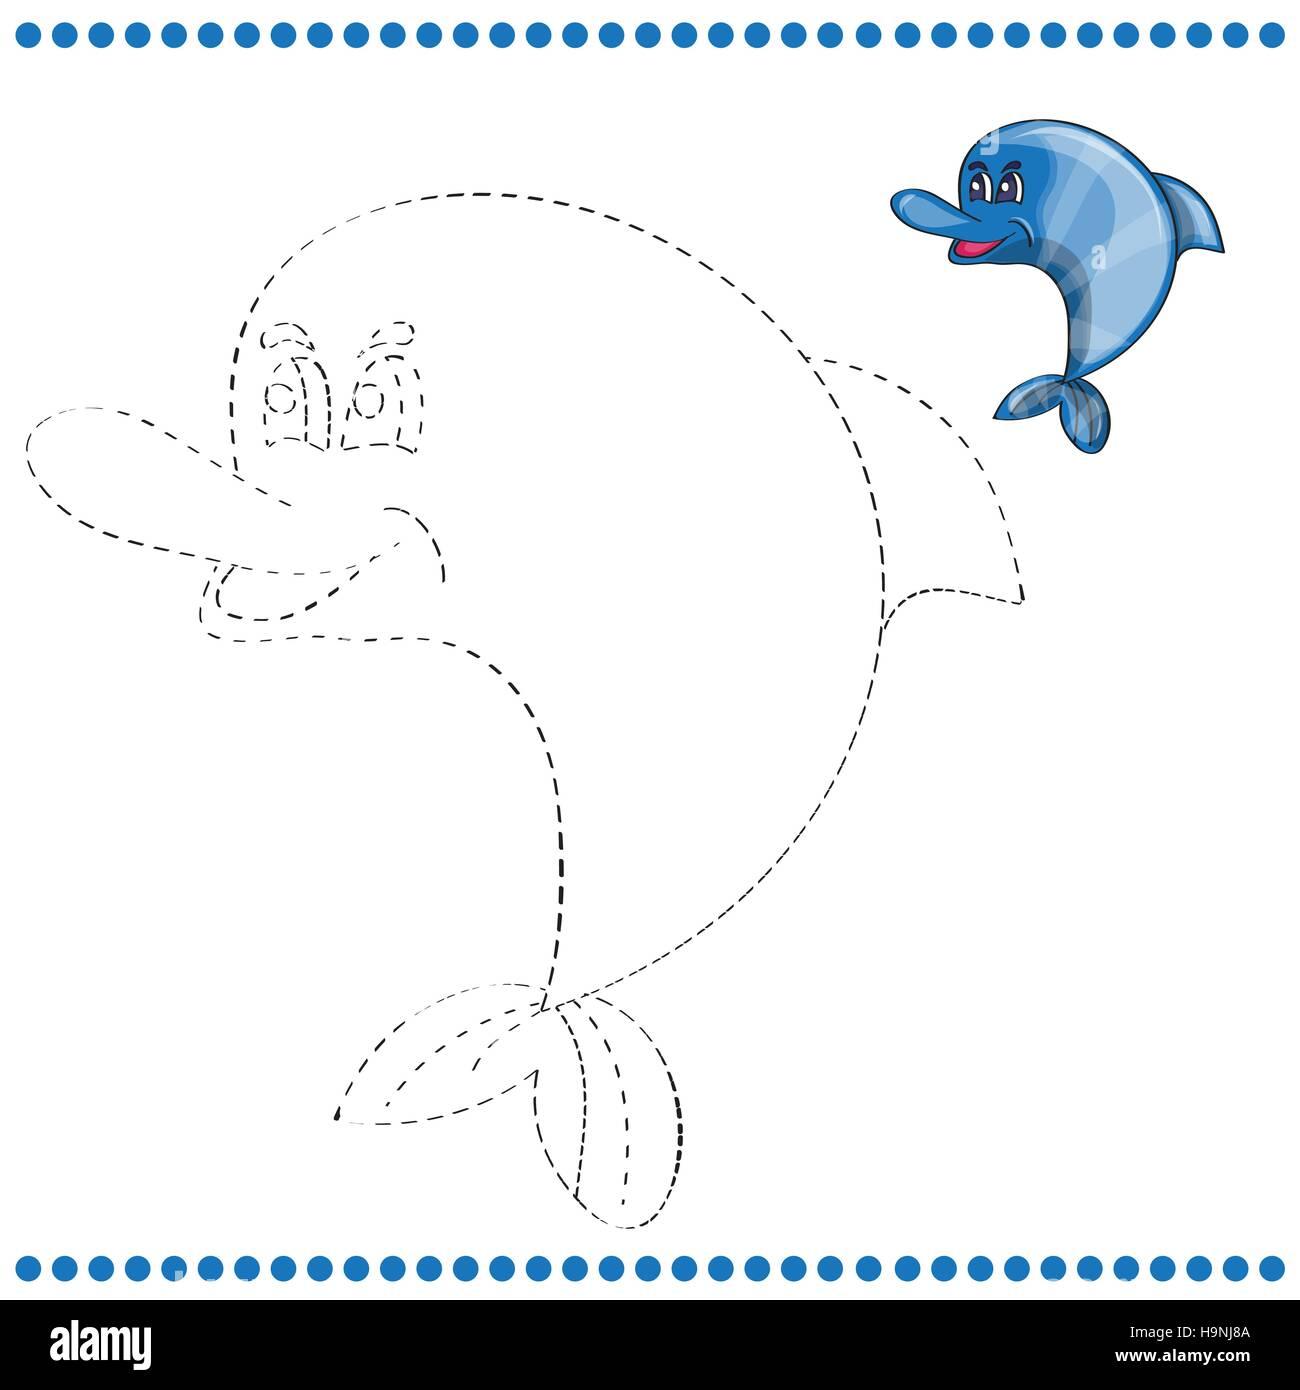 Dolphin Drawing Stockfotos & Dolphin Drawing Bilder - Seite 2 - Alamy